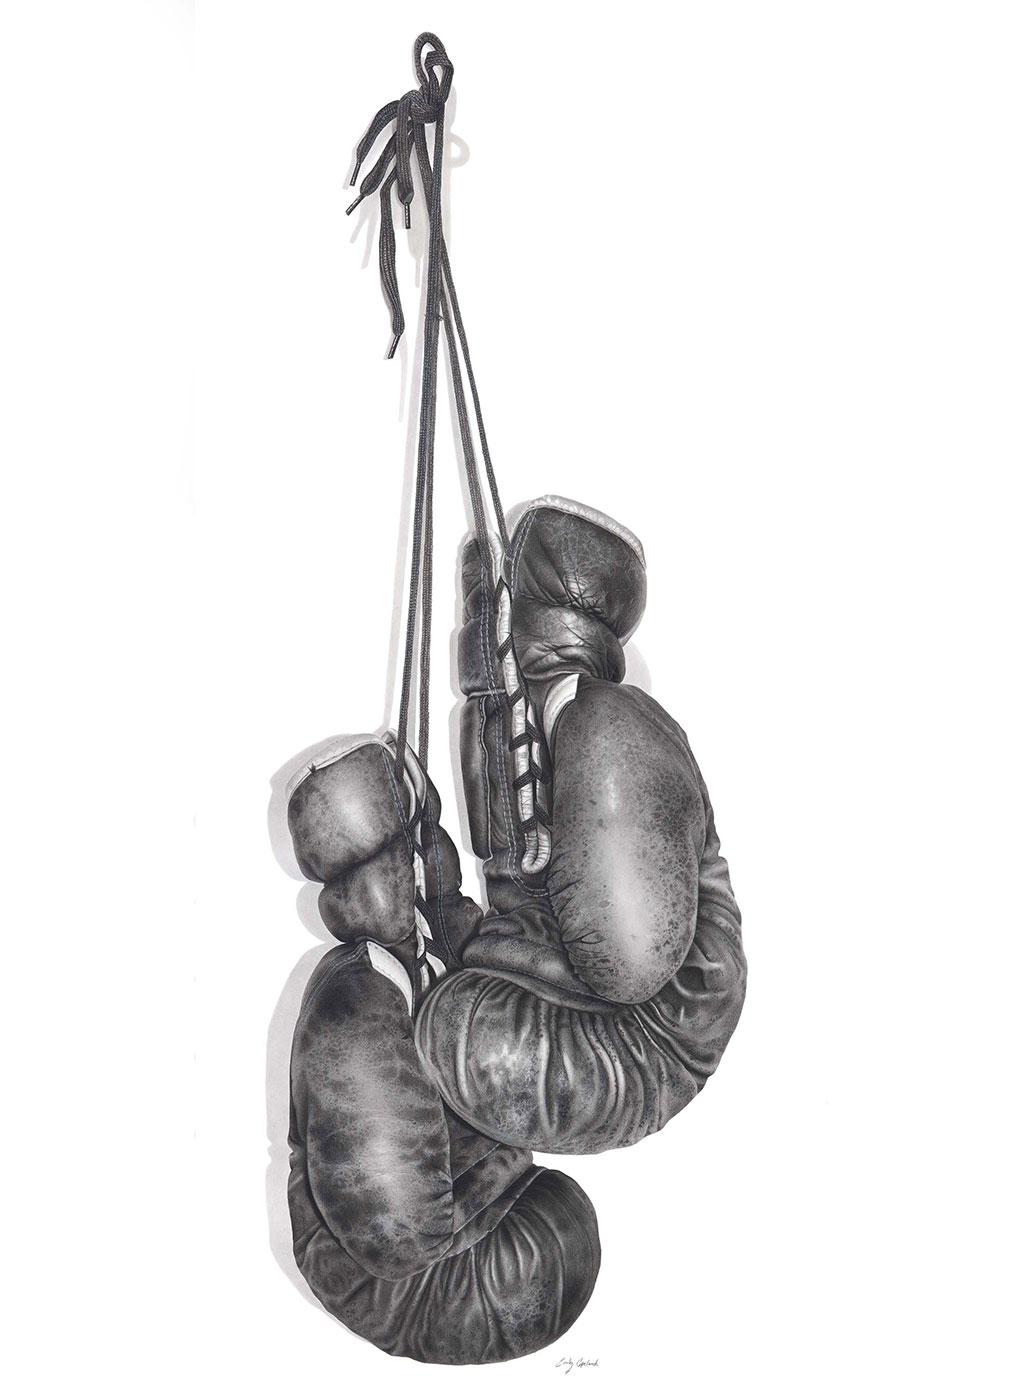 Antique Boxing Gloves – Emily Copeland